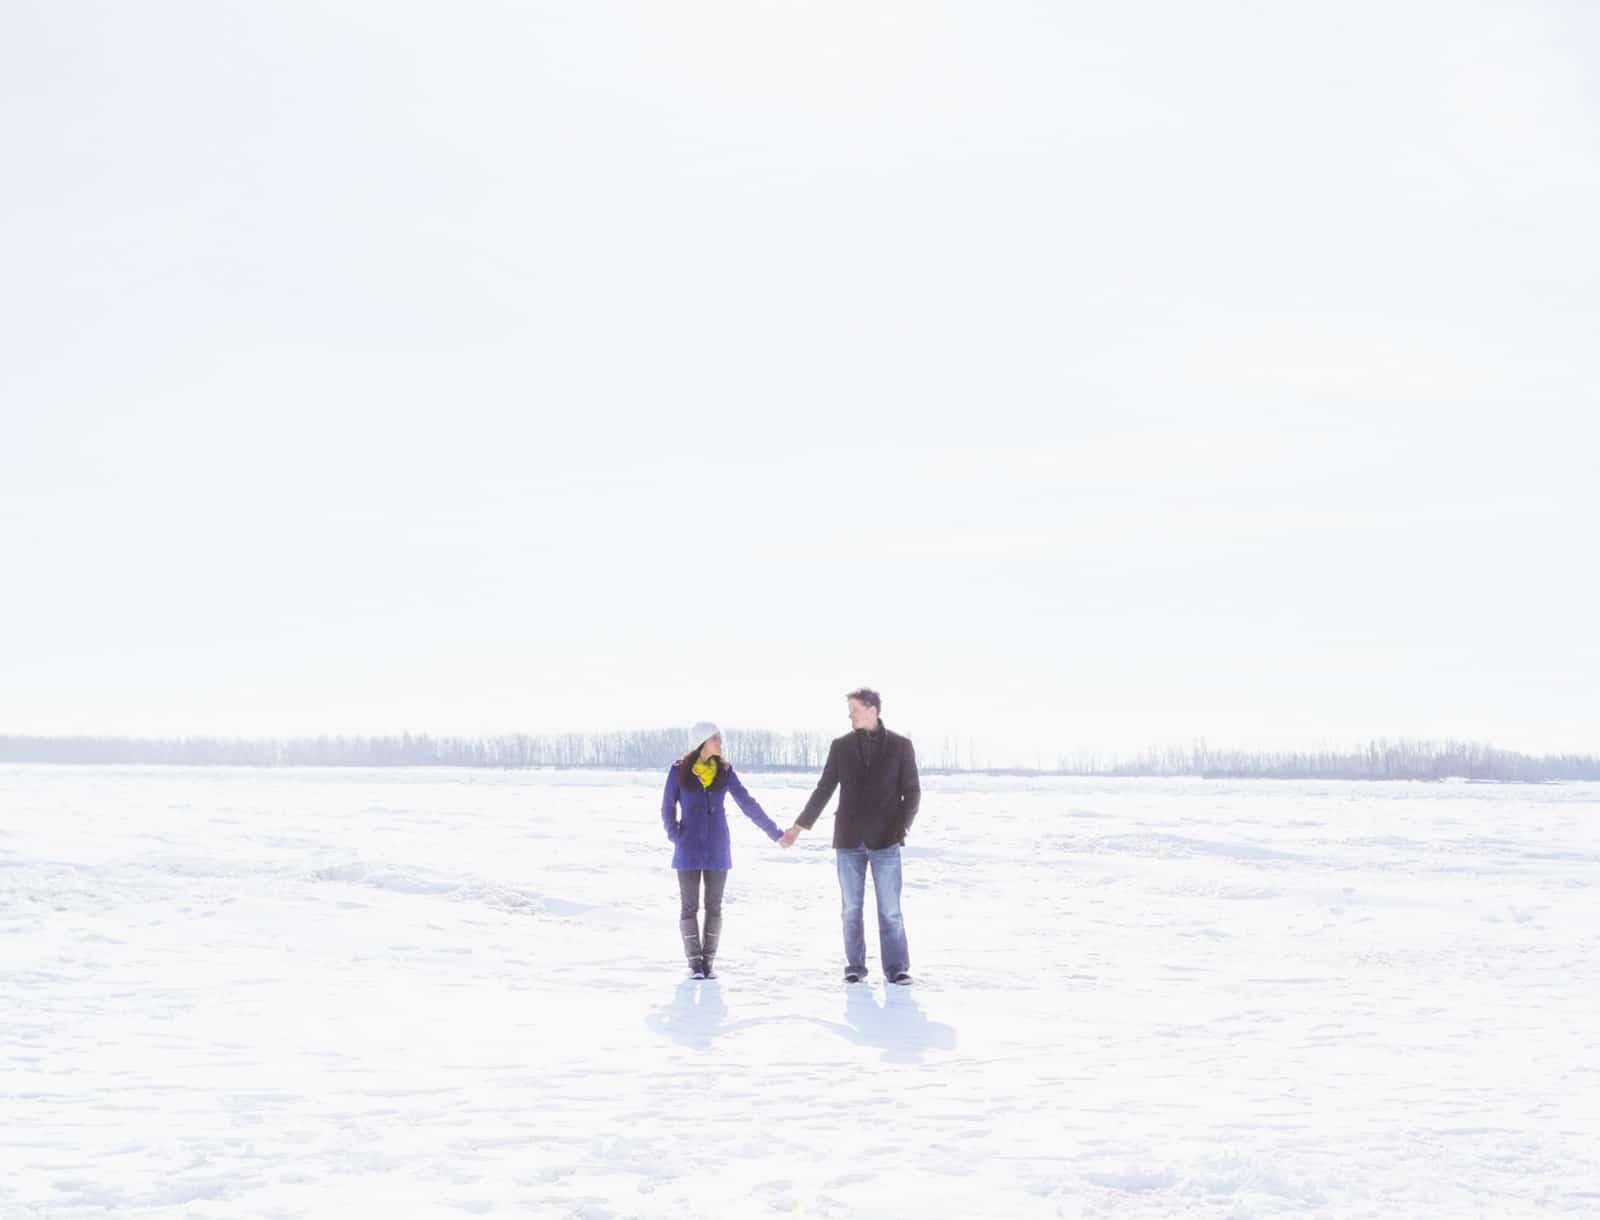 Toronto Winter Engagement Photos at Riverdale Farms & Cherry Beach: Ashley & Colin